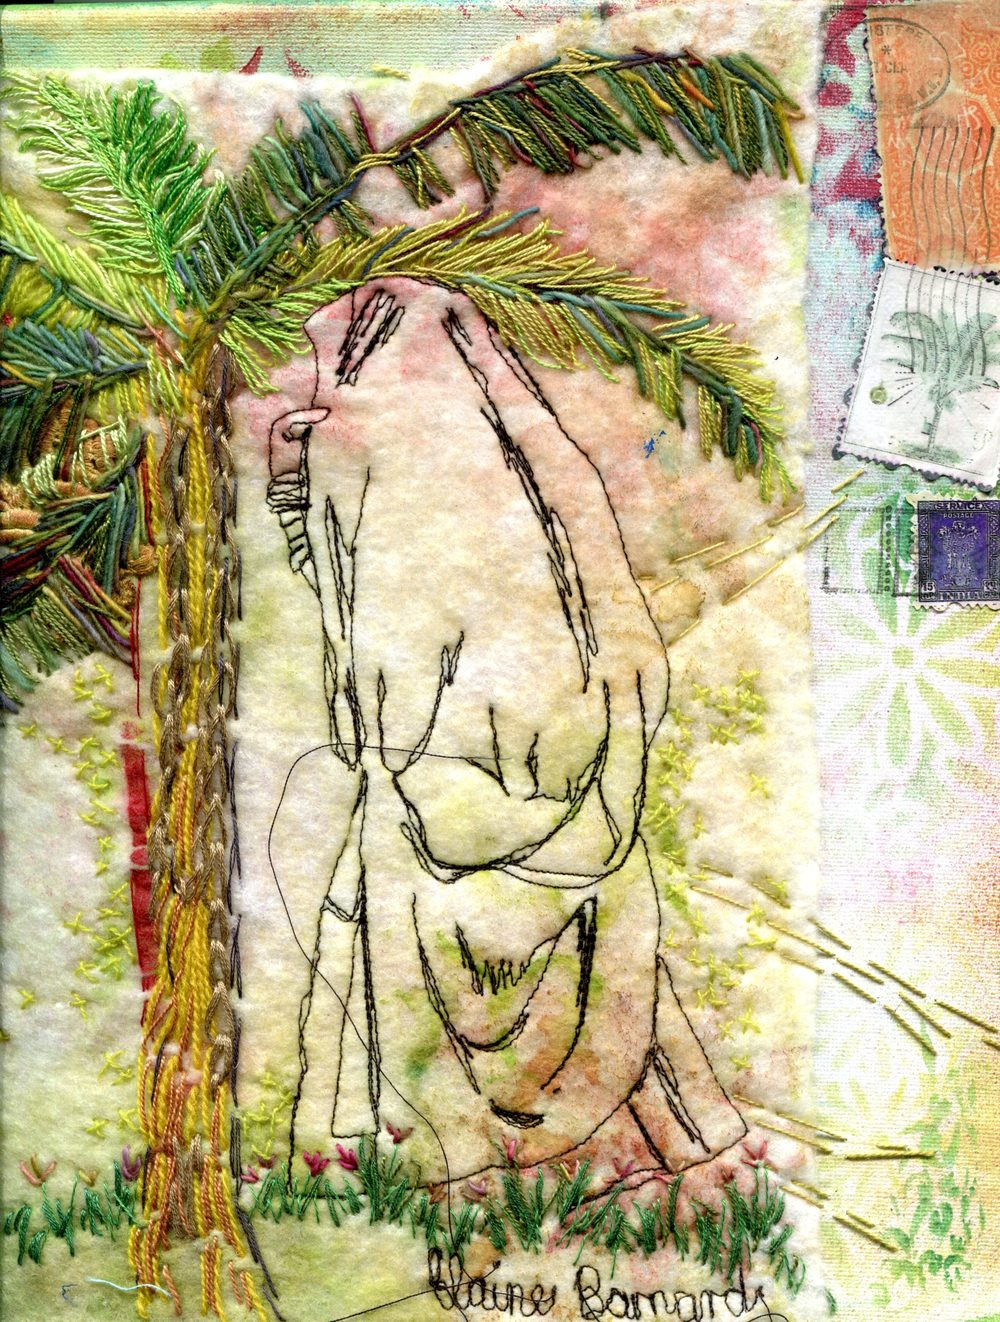 Barnard, Elaine 66 (right hand detail)  She Walks as in a Dream, Fibre art